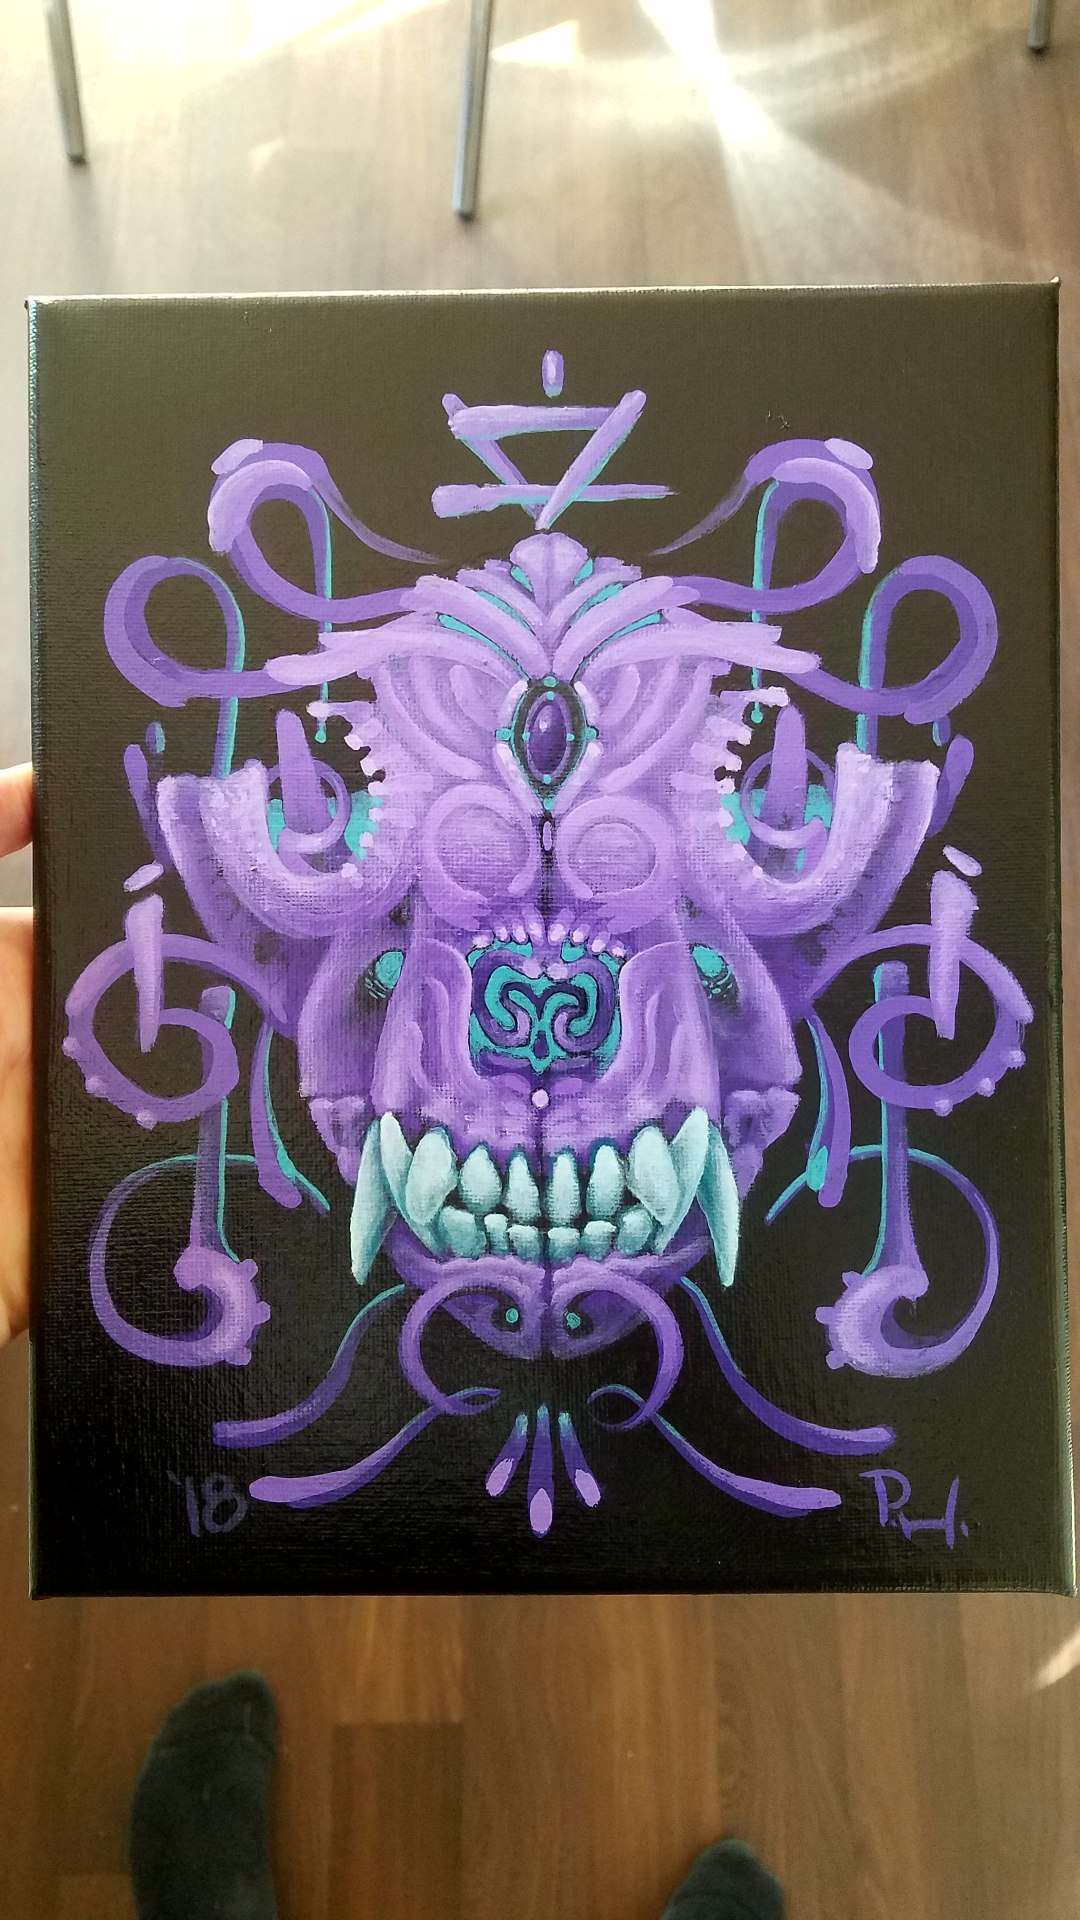 Beatle Stag bug art painting surrealist surreal orange teal filigree orbs gold earth dog alchemy alchemist skull symbol succulent black hofmeister ddef san jose california artist painter dream